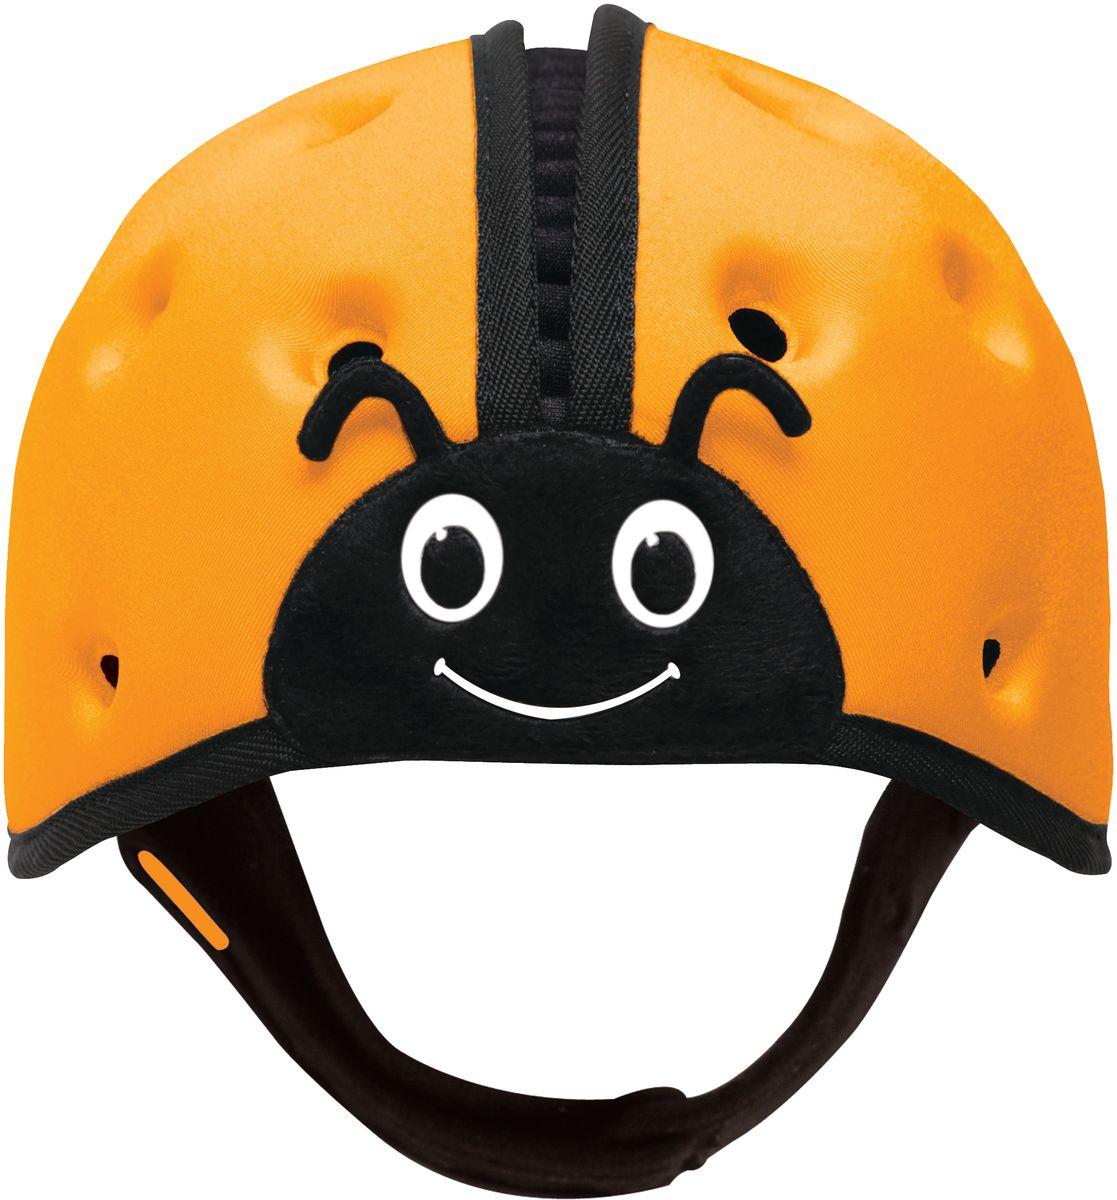 SafeheadBABY Шапка-шлем Божья коровка цвет оранжевый